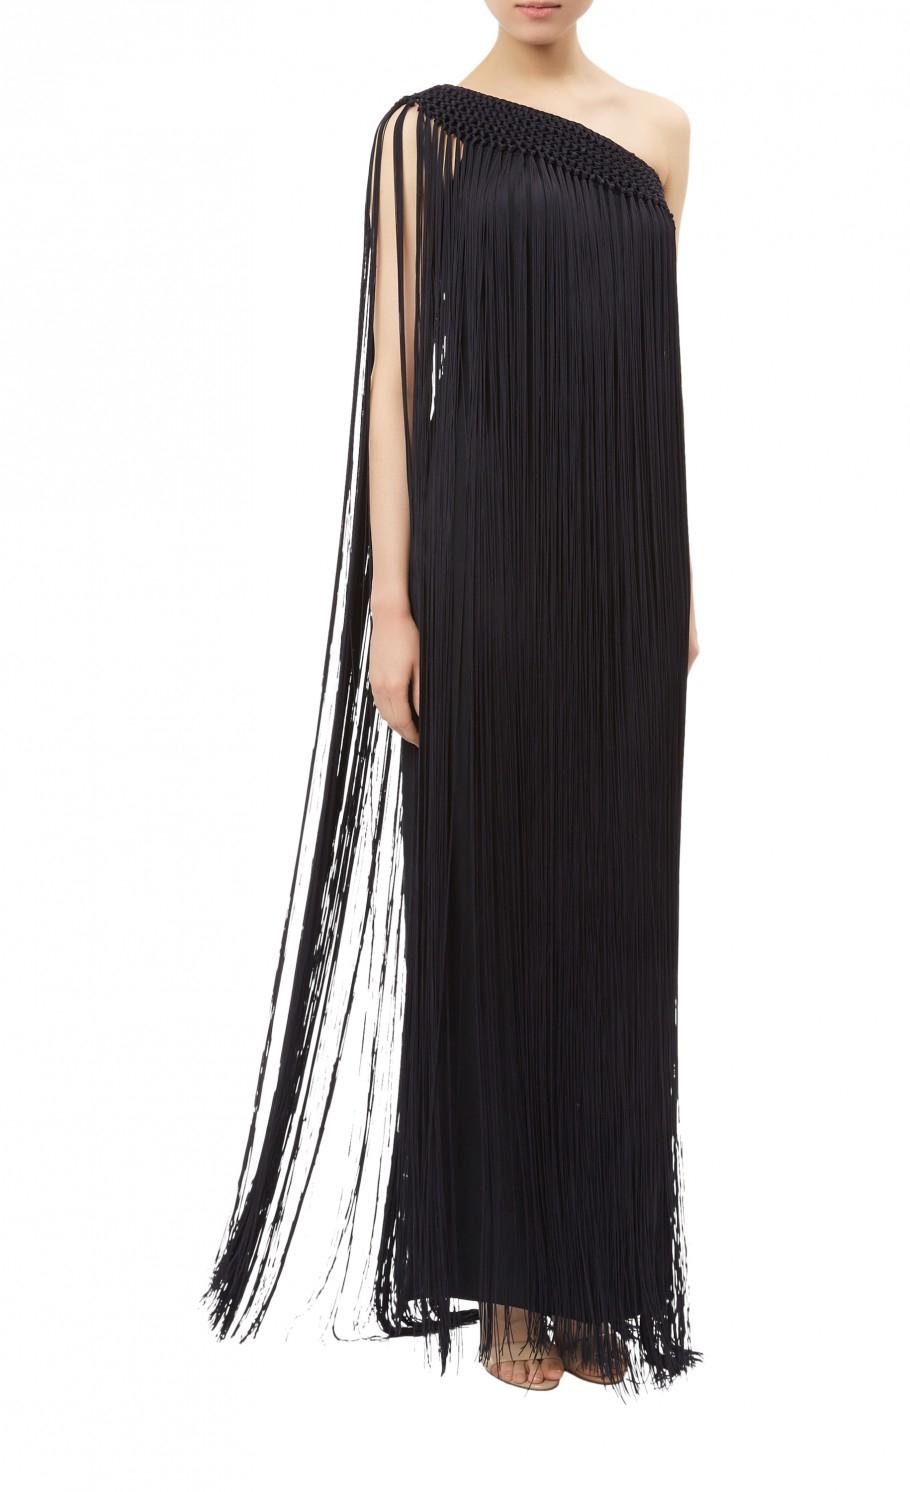 Temperley london Long Damara Fringe Dress in Black